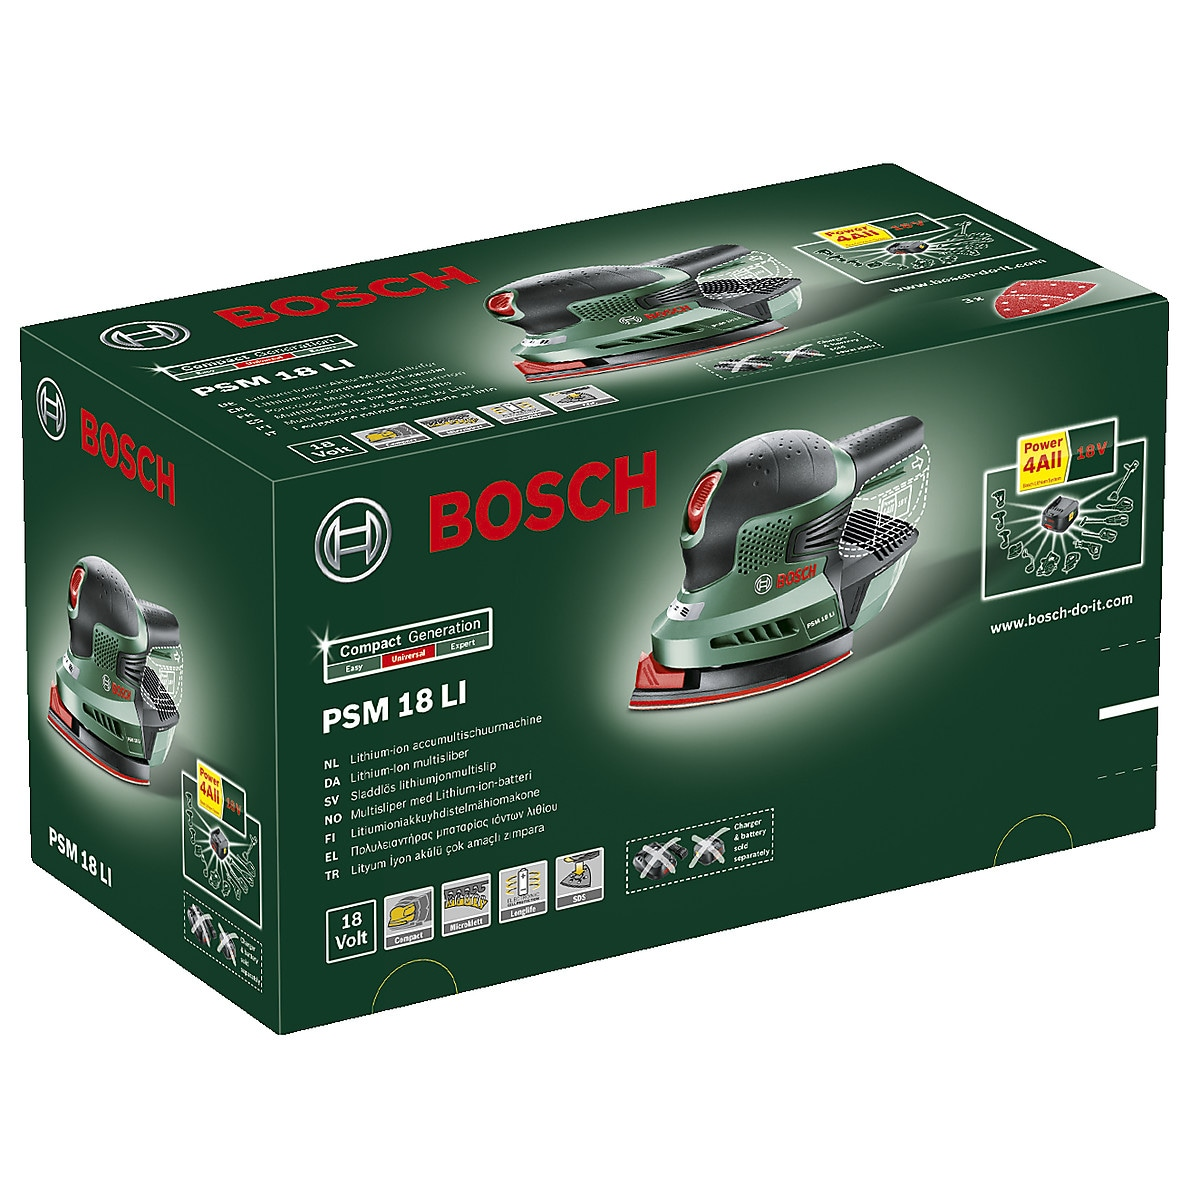 Multihiomakone Bosch PSM 18 LI